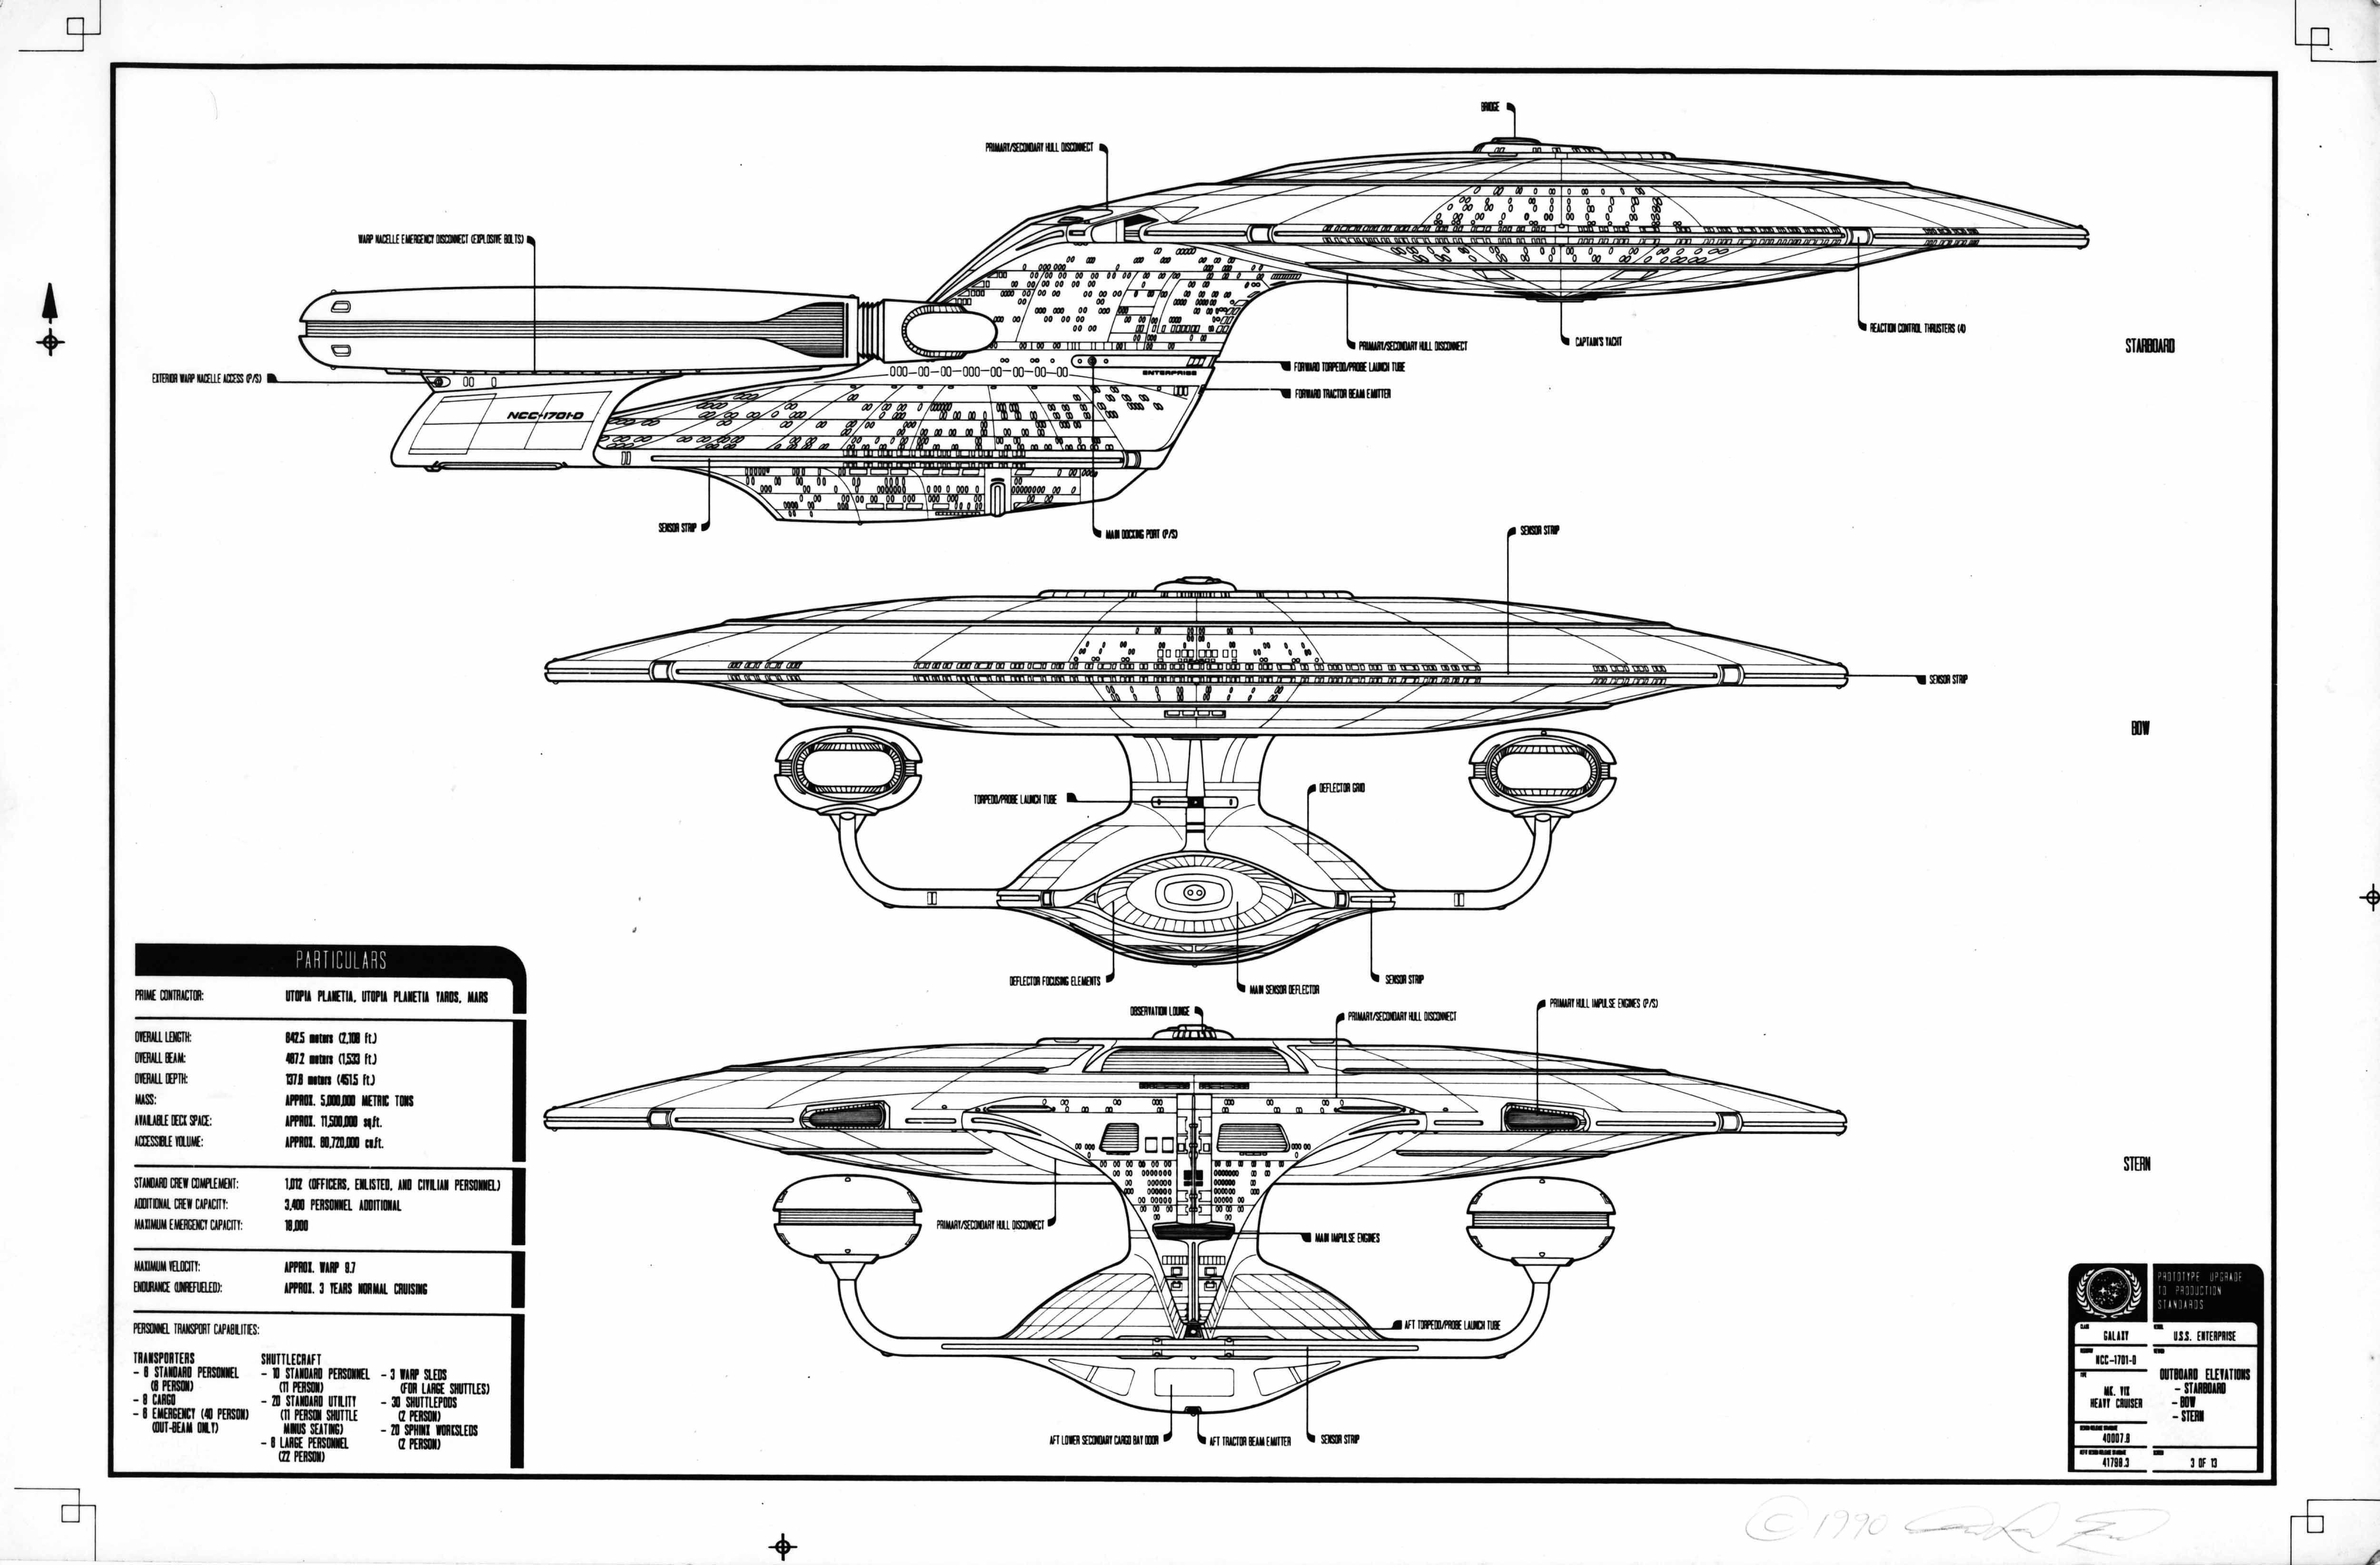 Uss enterprise ncc 1701 d galaxy class saucer separation r flickr - Star Trek Blueprints Google Search Uss Enterprise Ncc 1701star